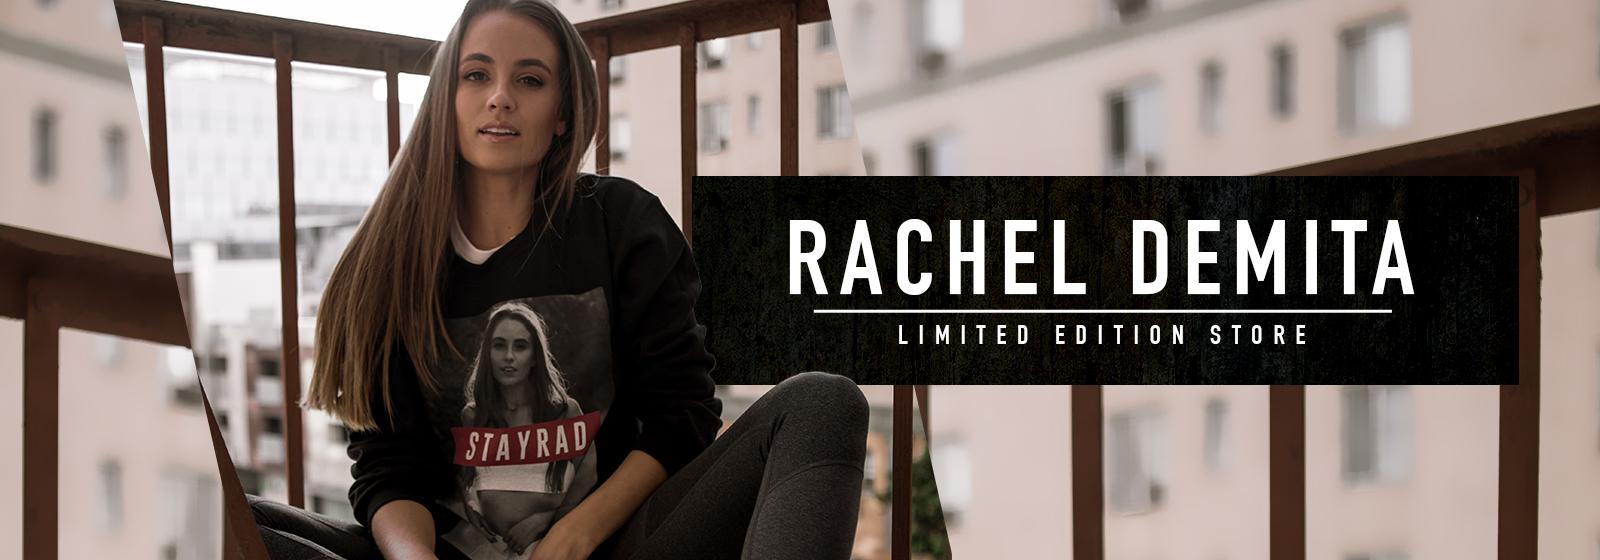 Rachel DeMita Collection Store